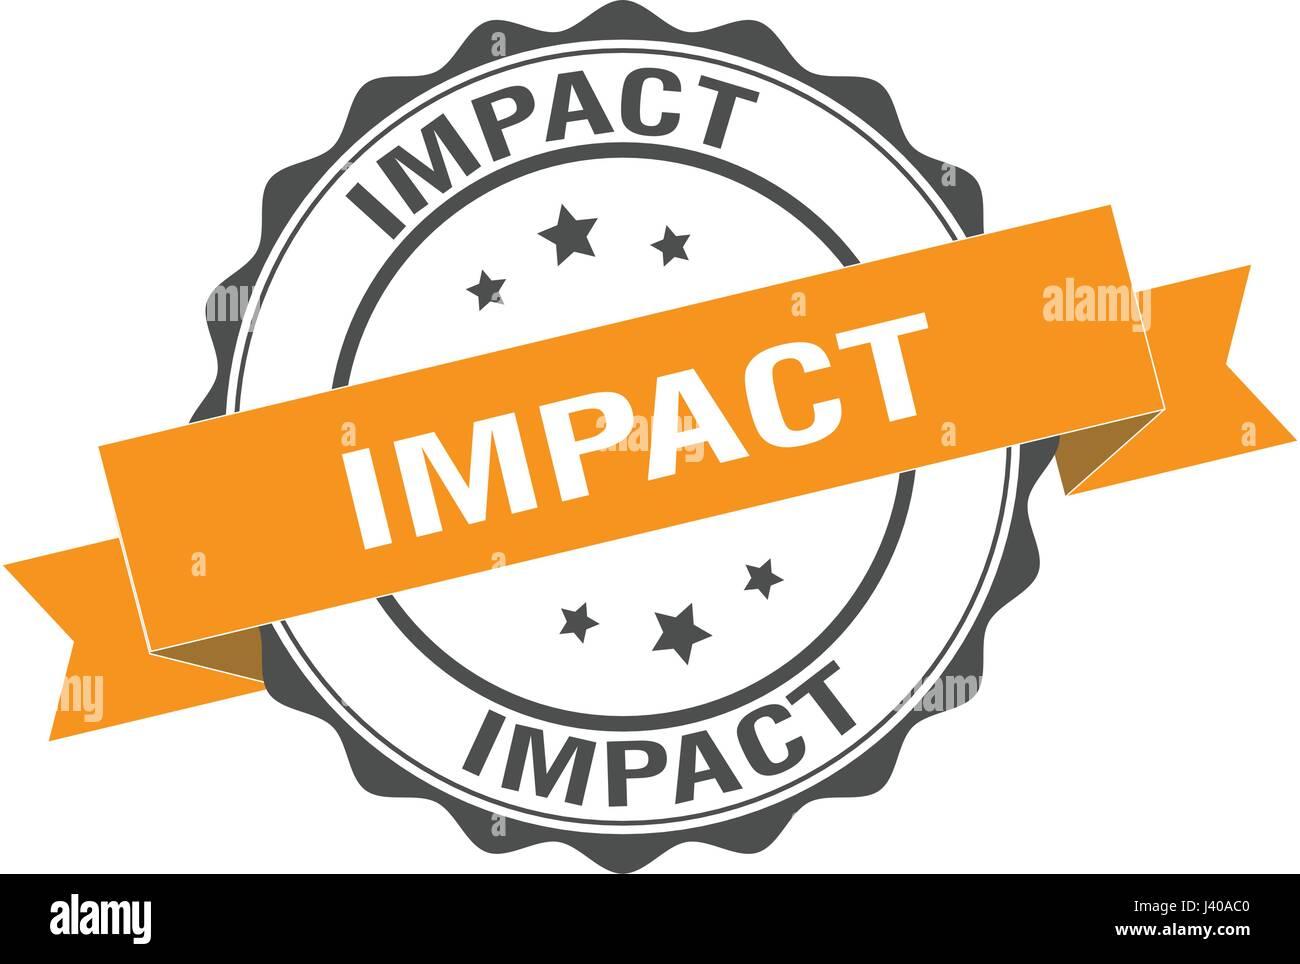 Impact stamp illustration - Stock Image